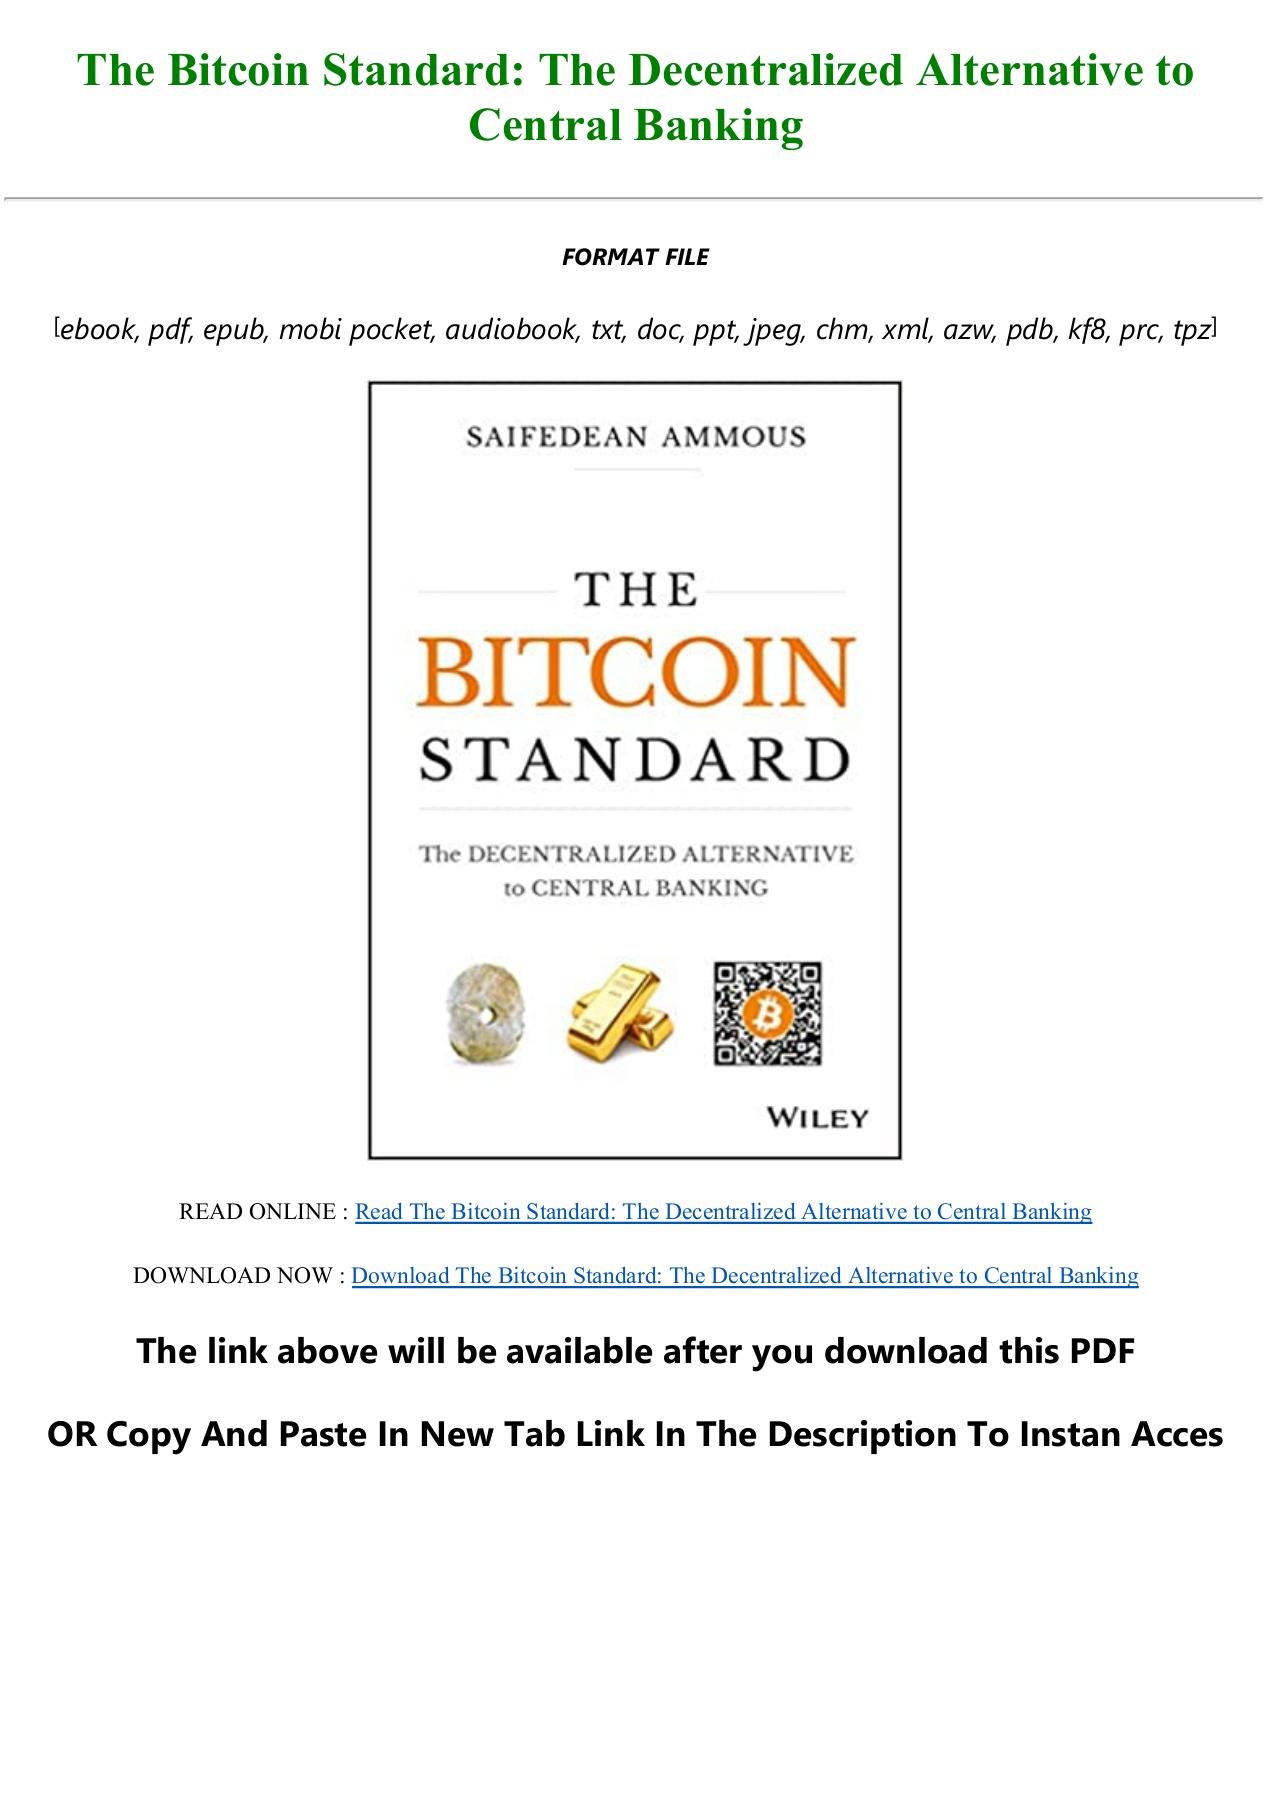 The Bitcoin Standard Pdf Book